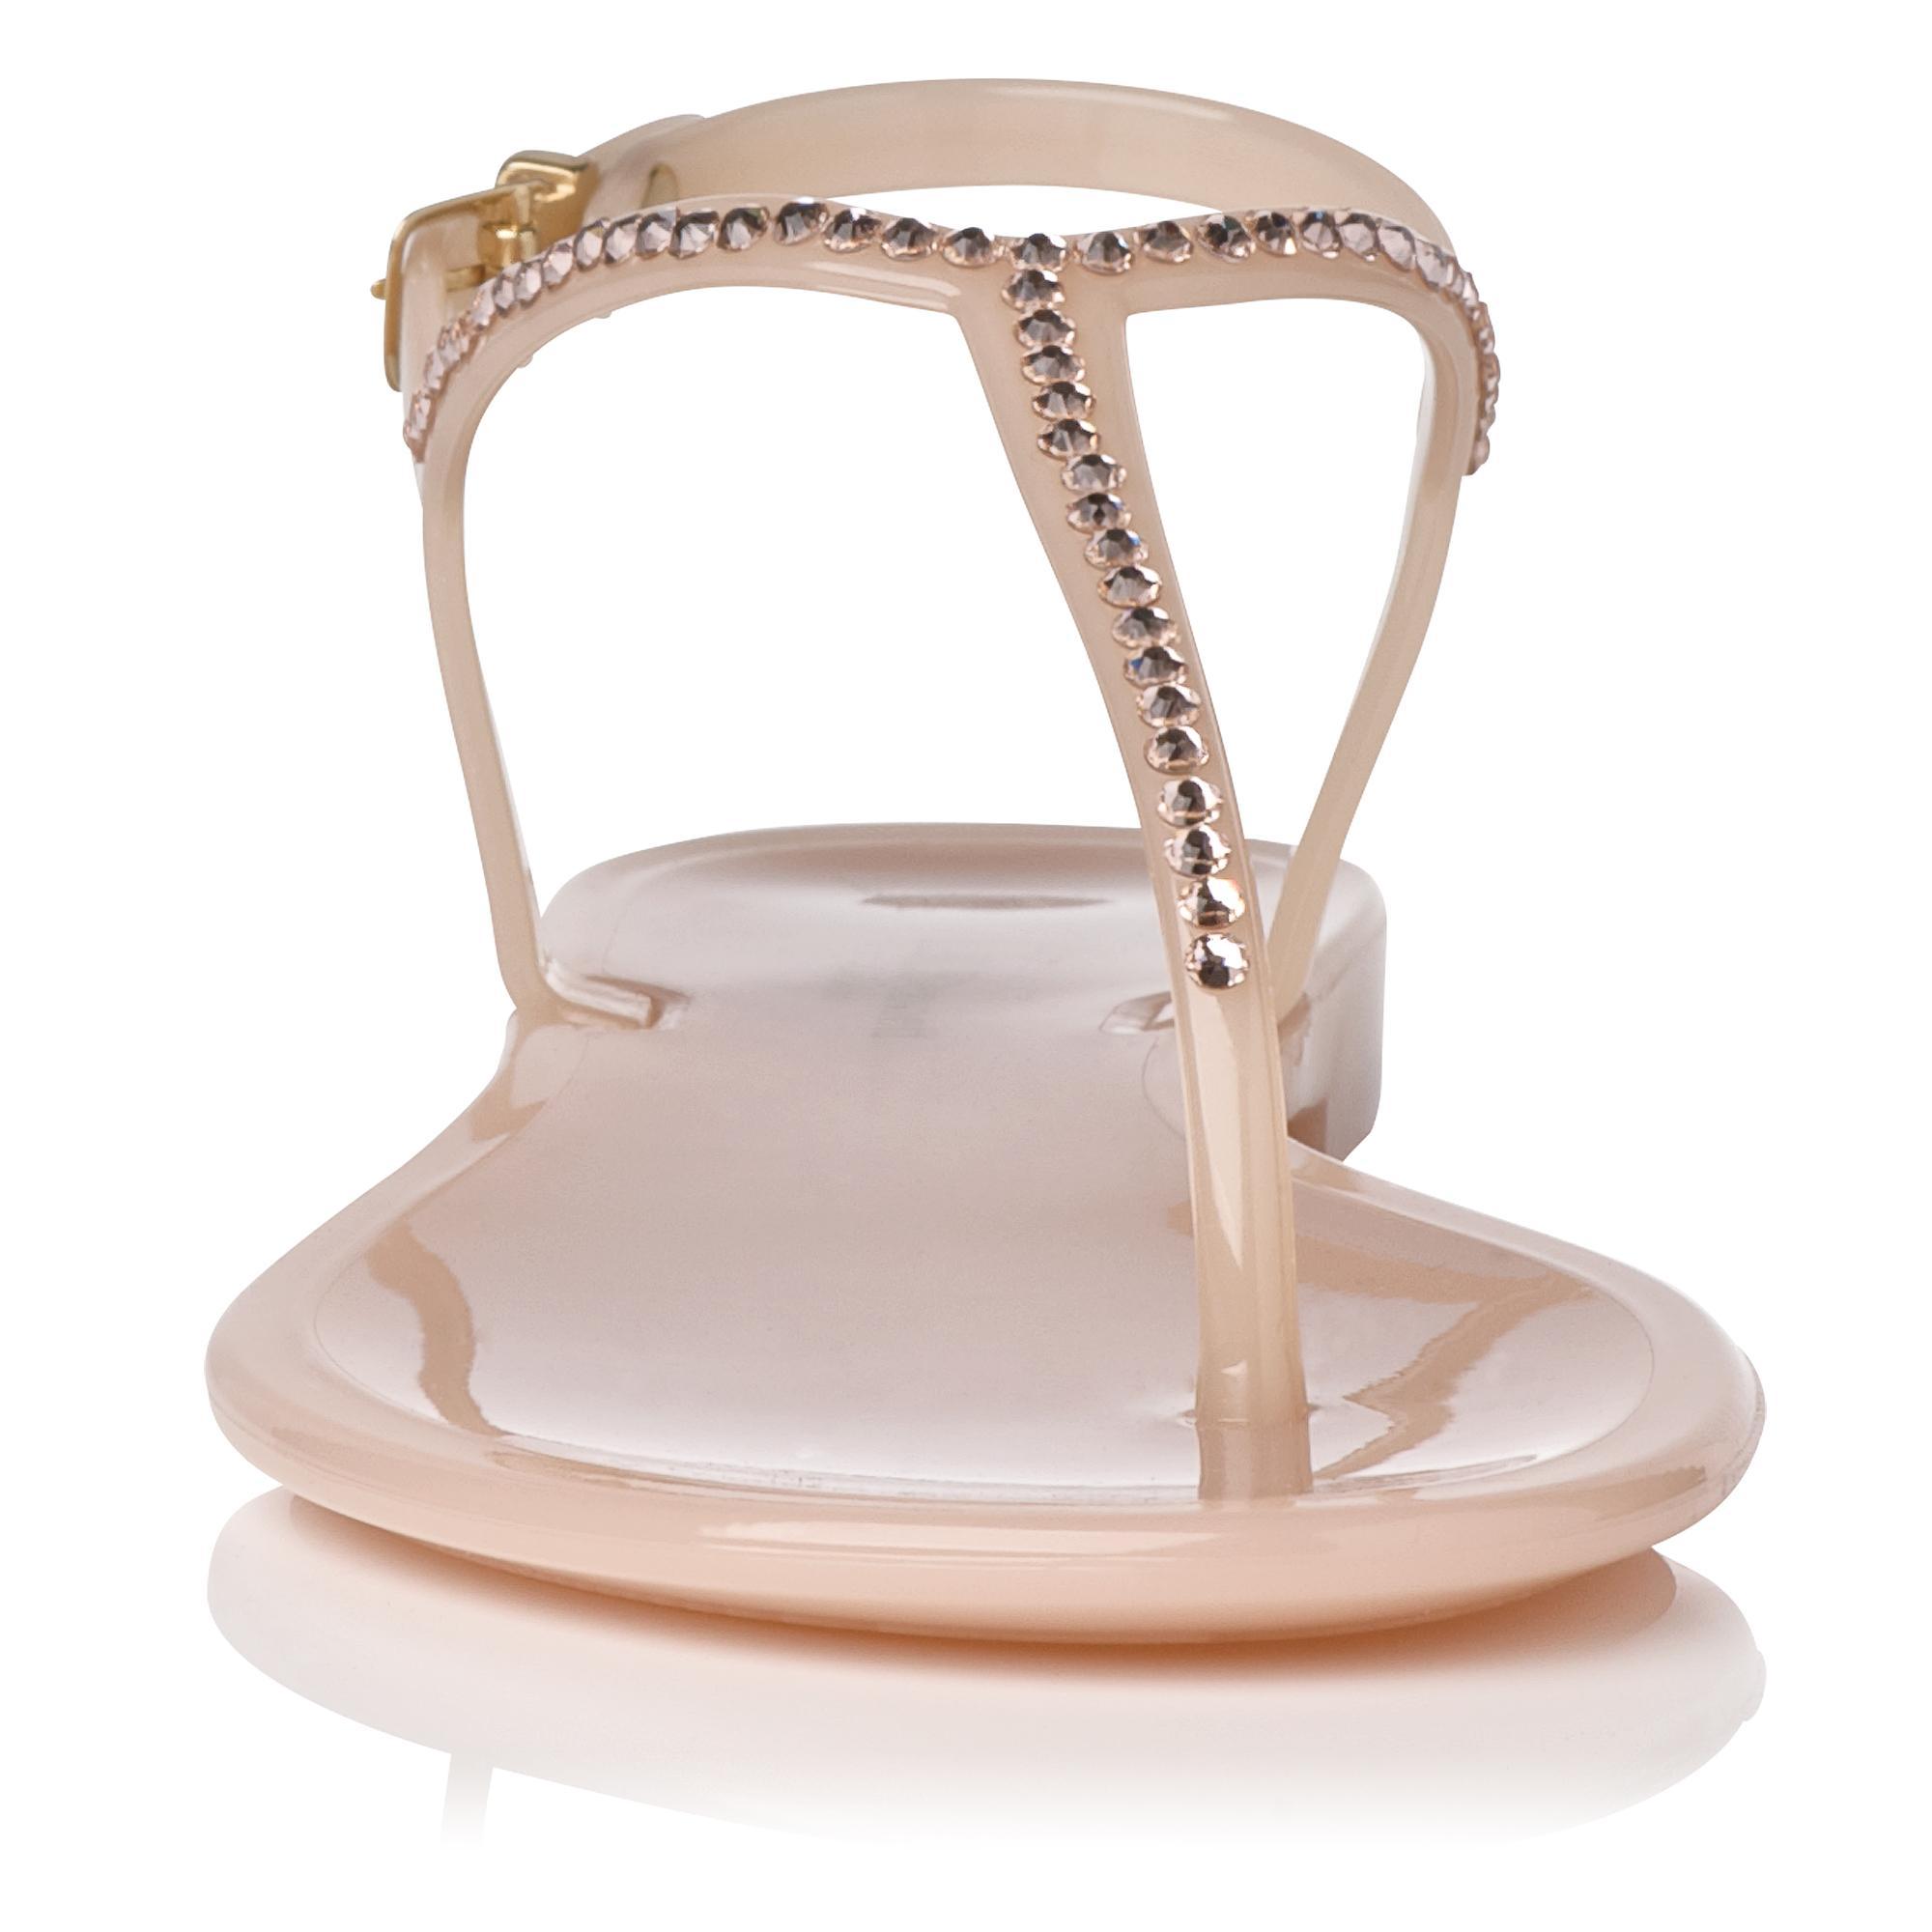 16465e7abdaa Lola Jelly Flat Sandal